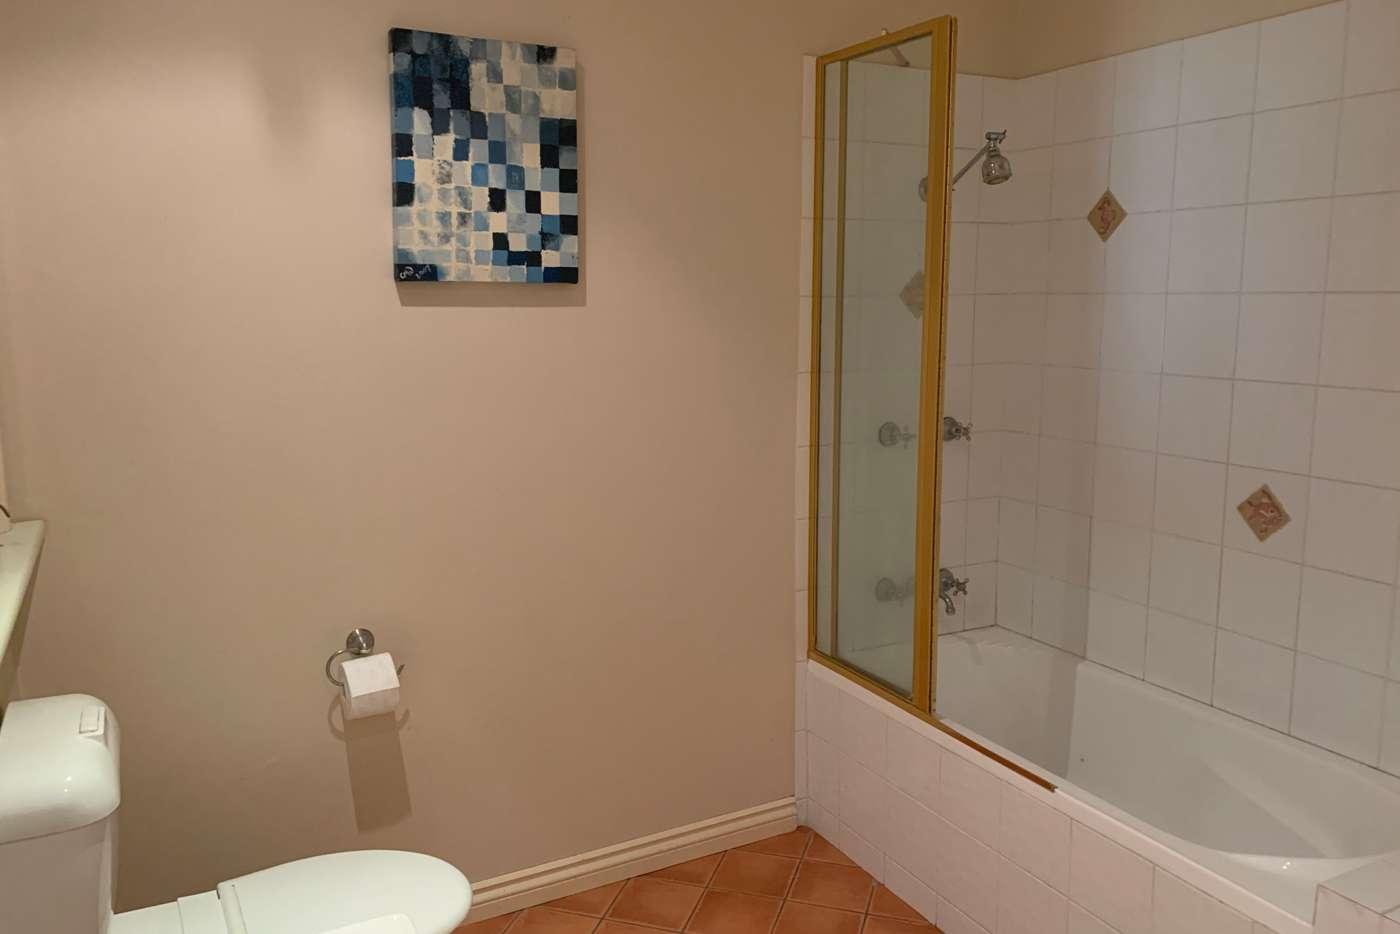 Sixth view of Homely unit listing, 39 Ewart Street, Paddington QLD 4064